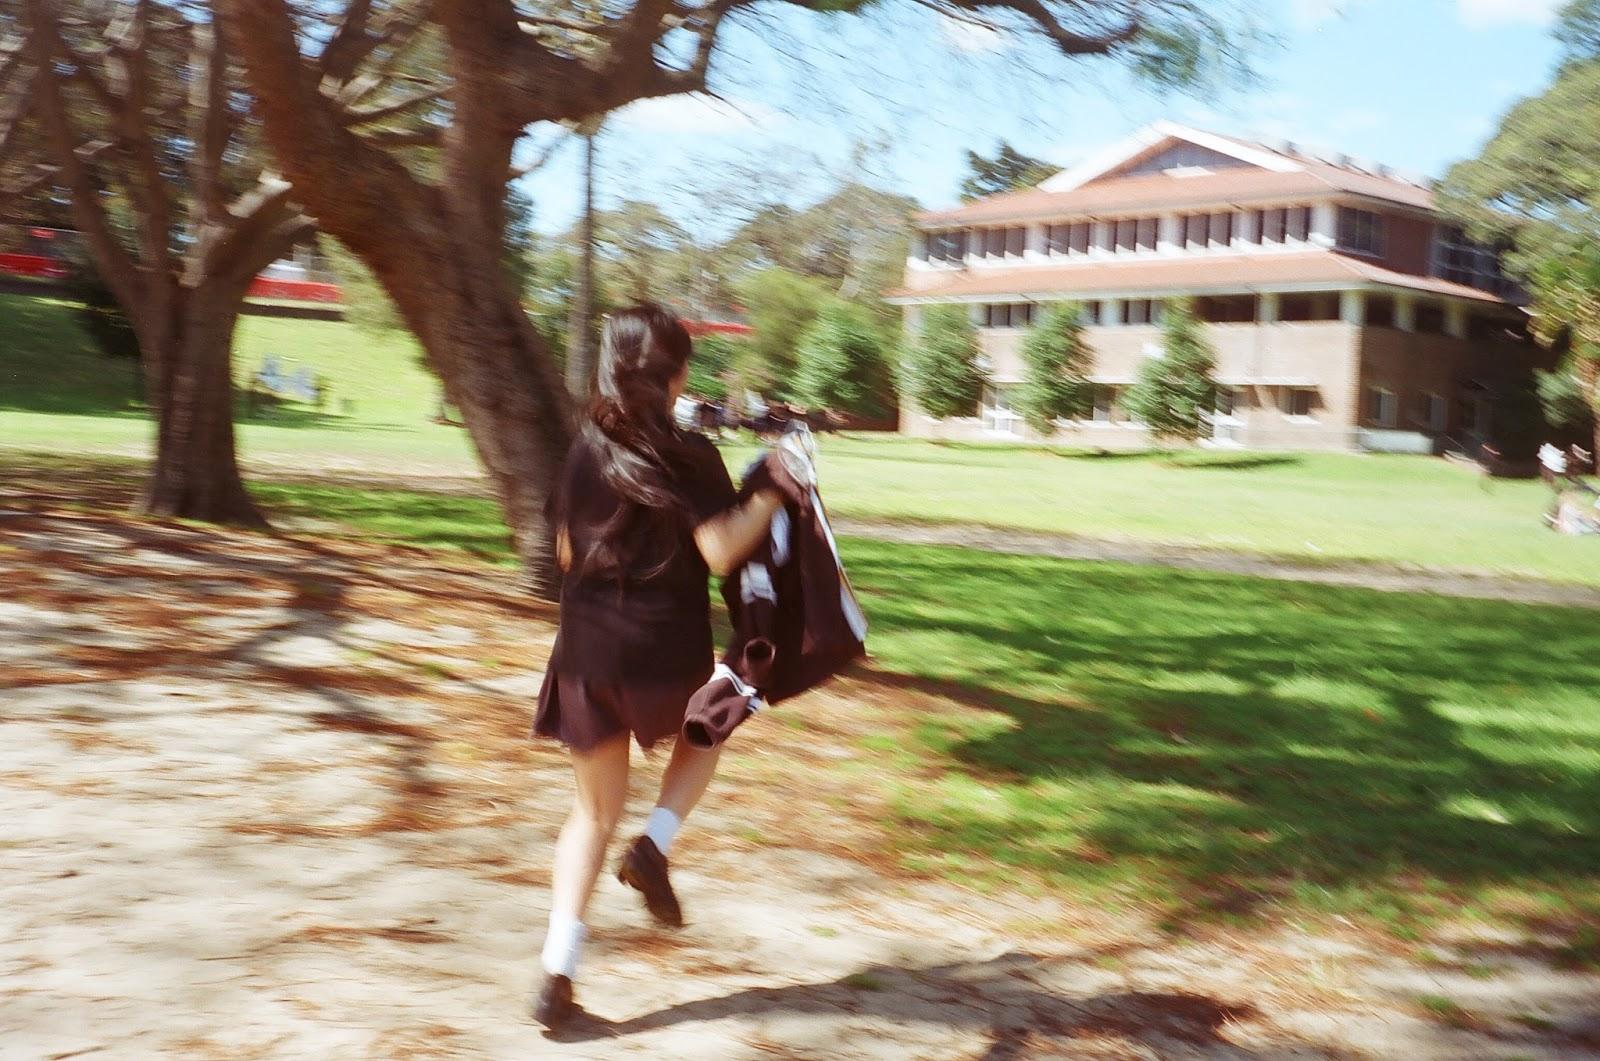 35mm, 35mm film, film, analog photography, photography, olympus, olympus trip 35, school, graduation, elashock, karen okuda, konichiwakaren, sydney girls, sghs